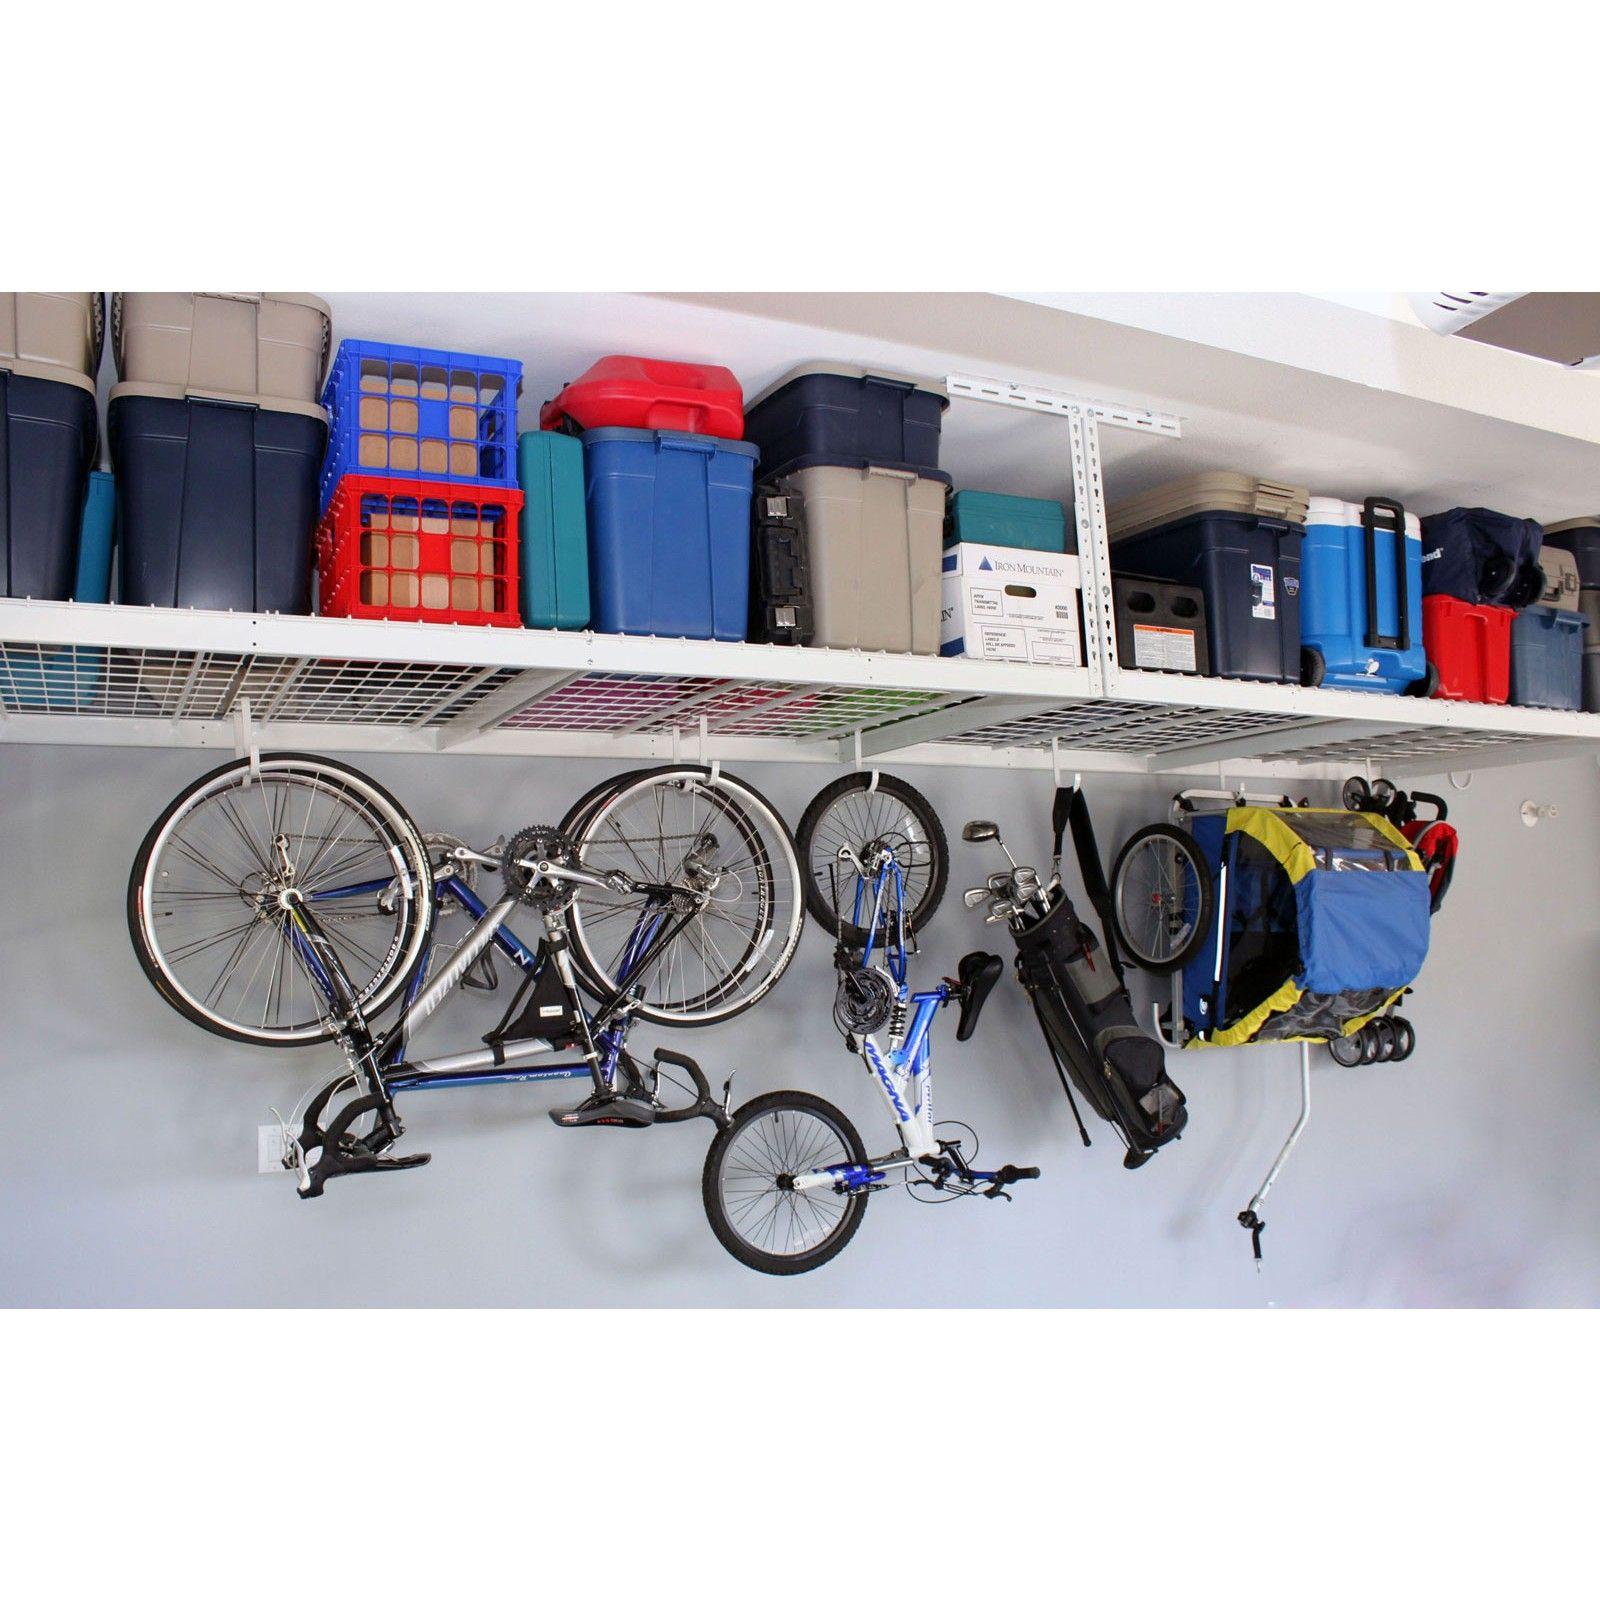 4x8 Overhead Garage Storage Rack Overhead Garage Storage Overhead Garage Garage Storage